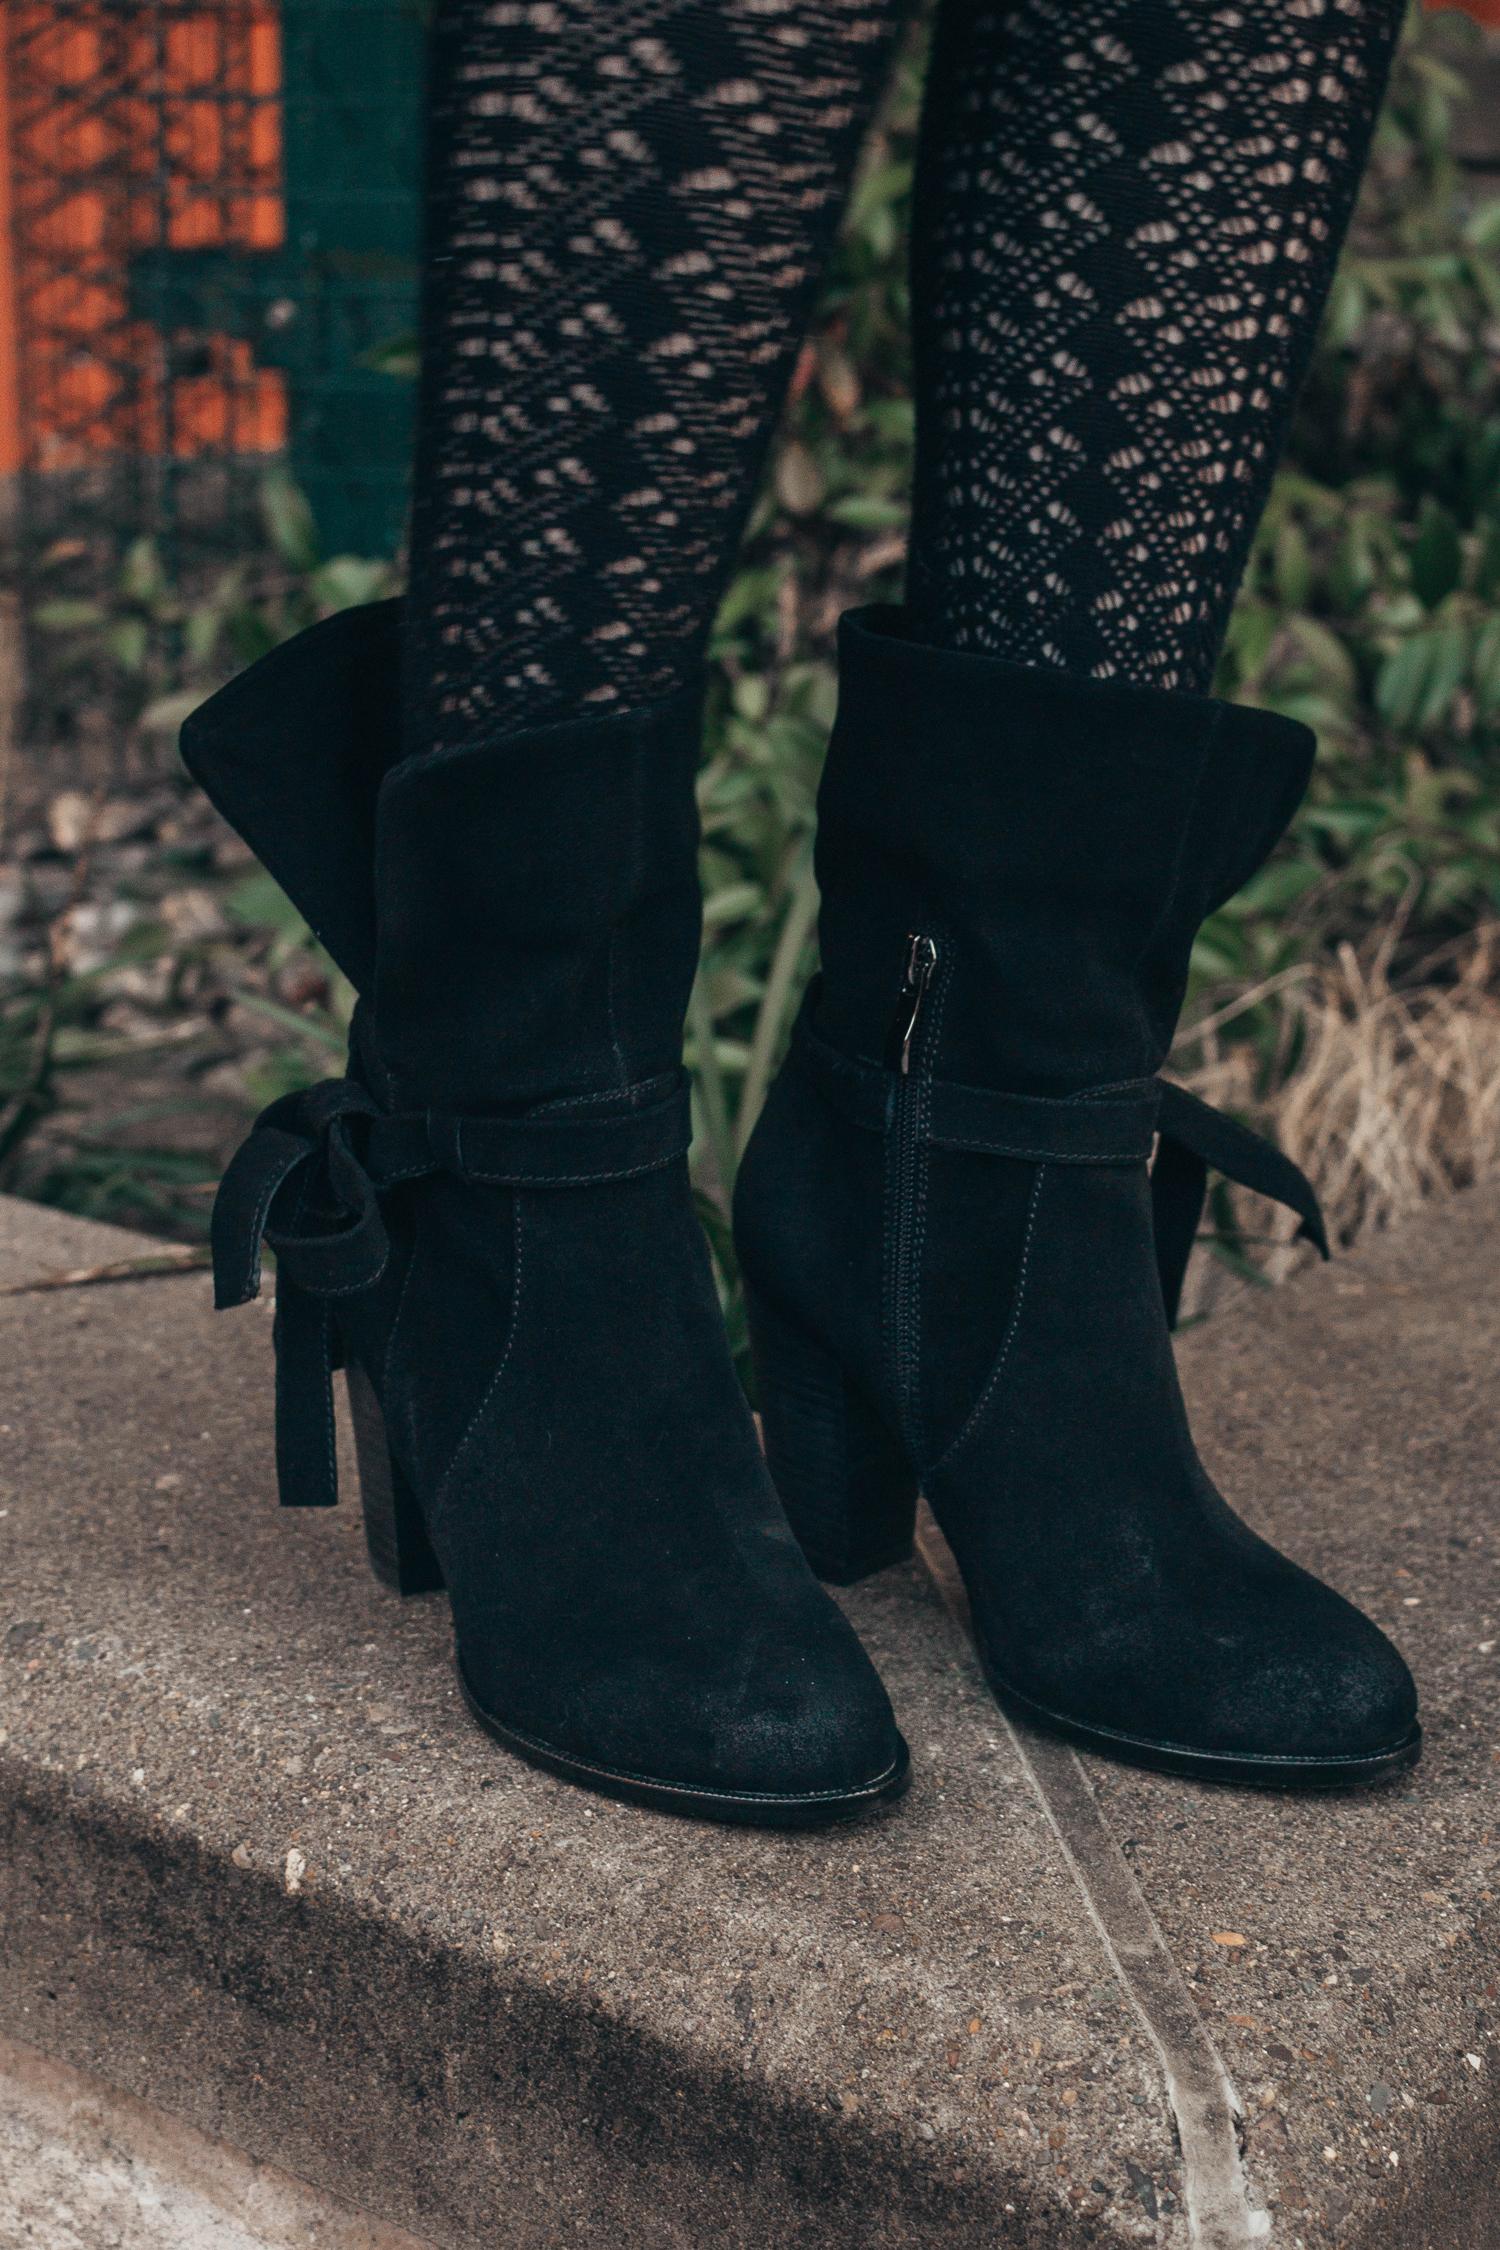 arktana shoes camas washington washougal boots heels boutique downtown bear mural